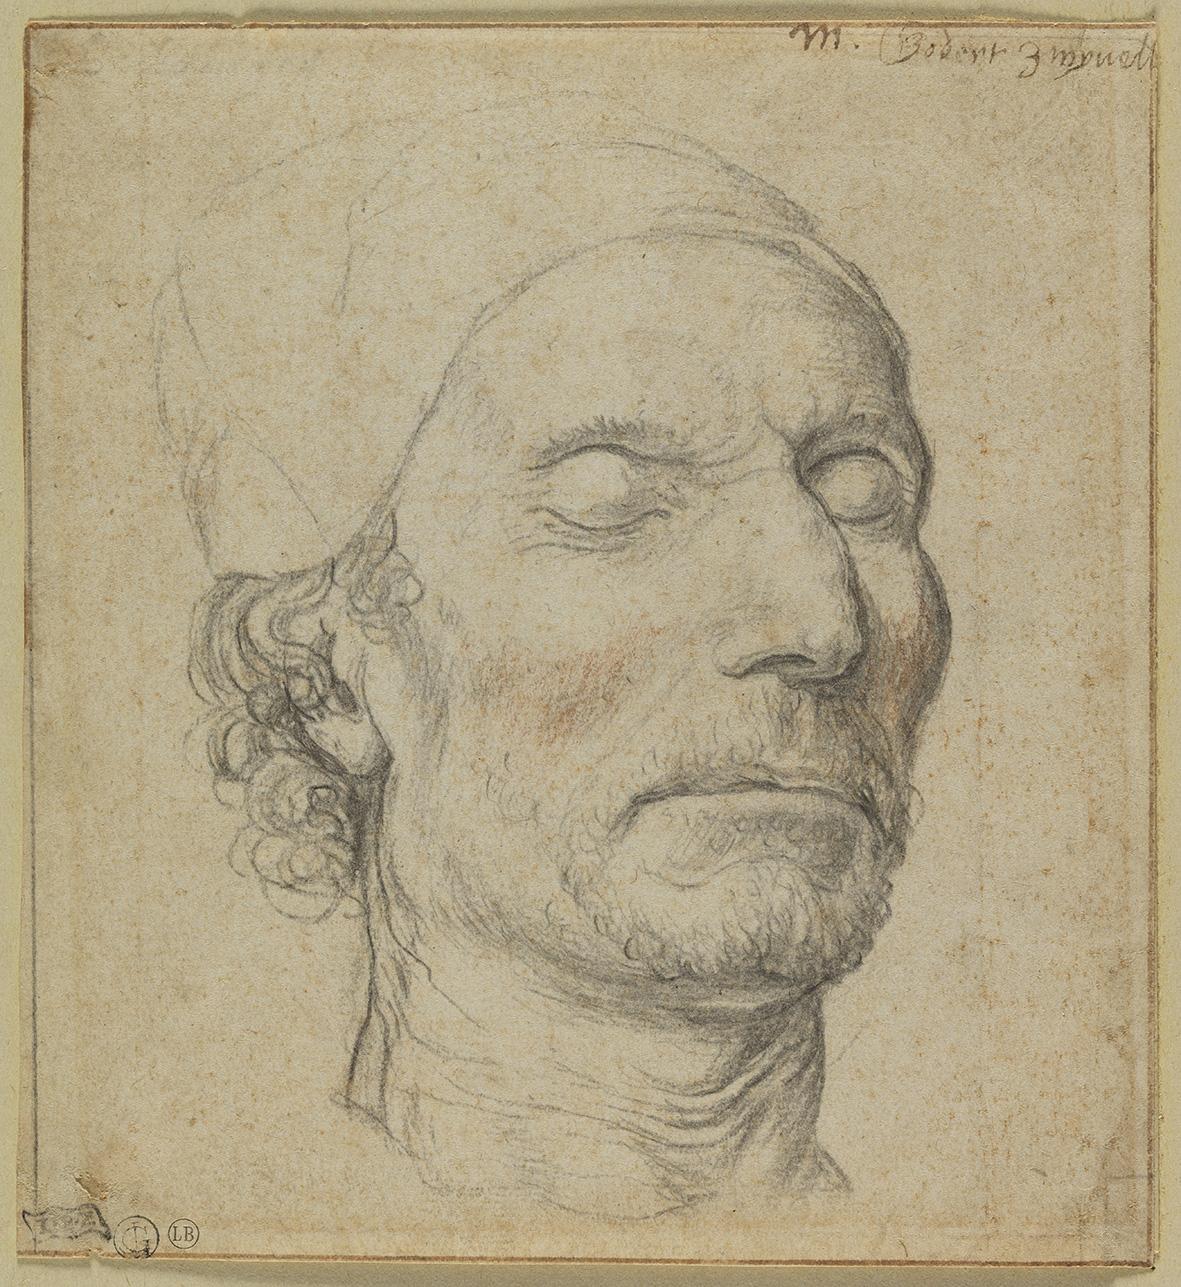 4. Bernaert de Rijckere (ca. 1535-1590), Head of a Man, ca. 1560, red and black chalk, 15 x 13.7 cm, inv. 1493